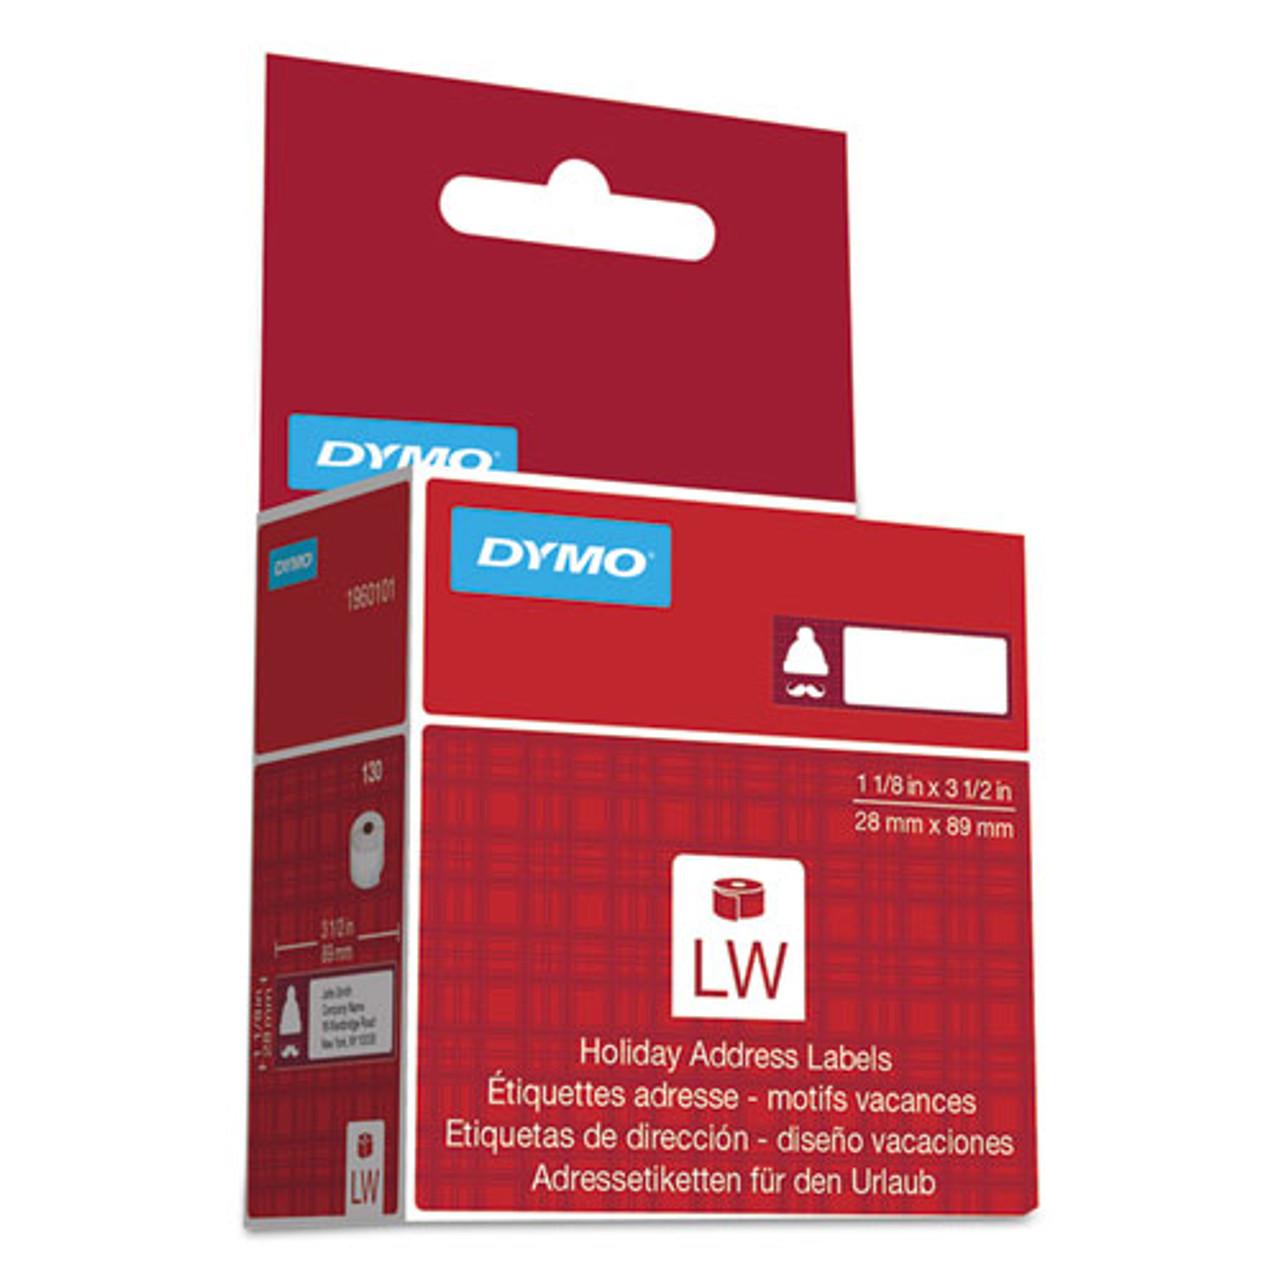 edizione limitata albero Tree Dymo LabelWriter Holiday Address Labels 28 x 89 mm